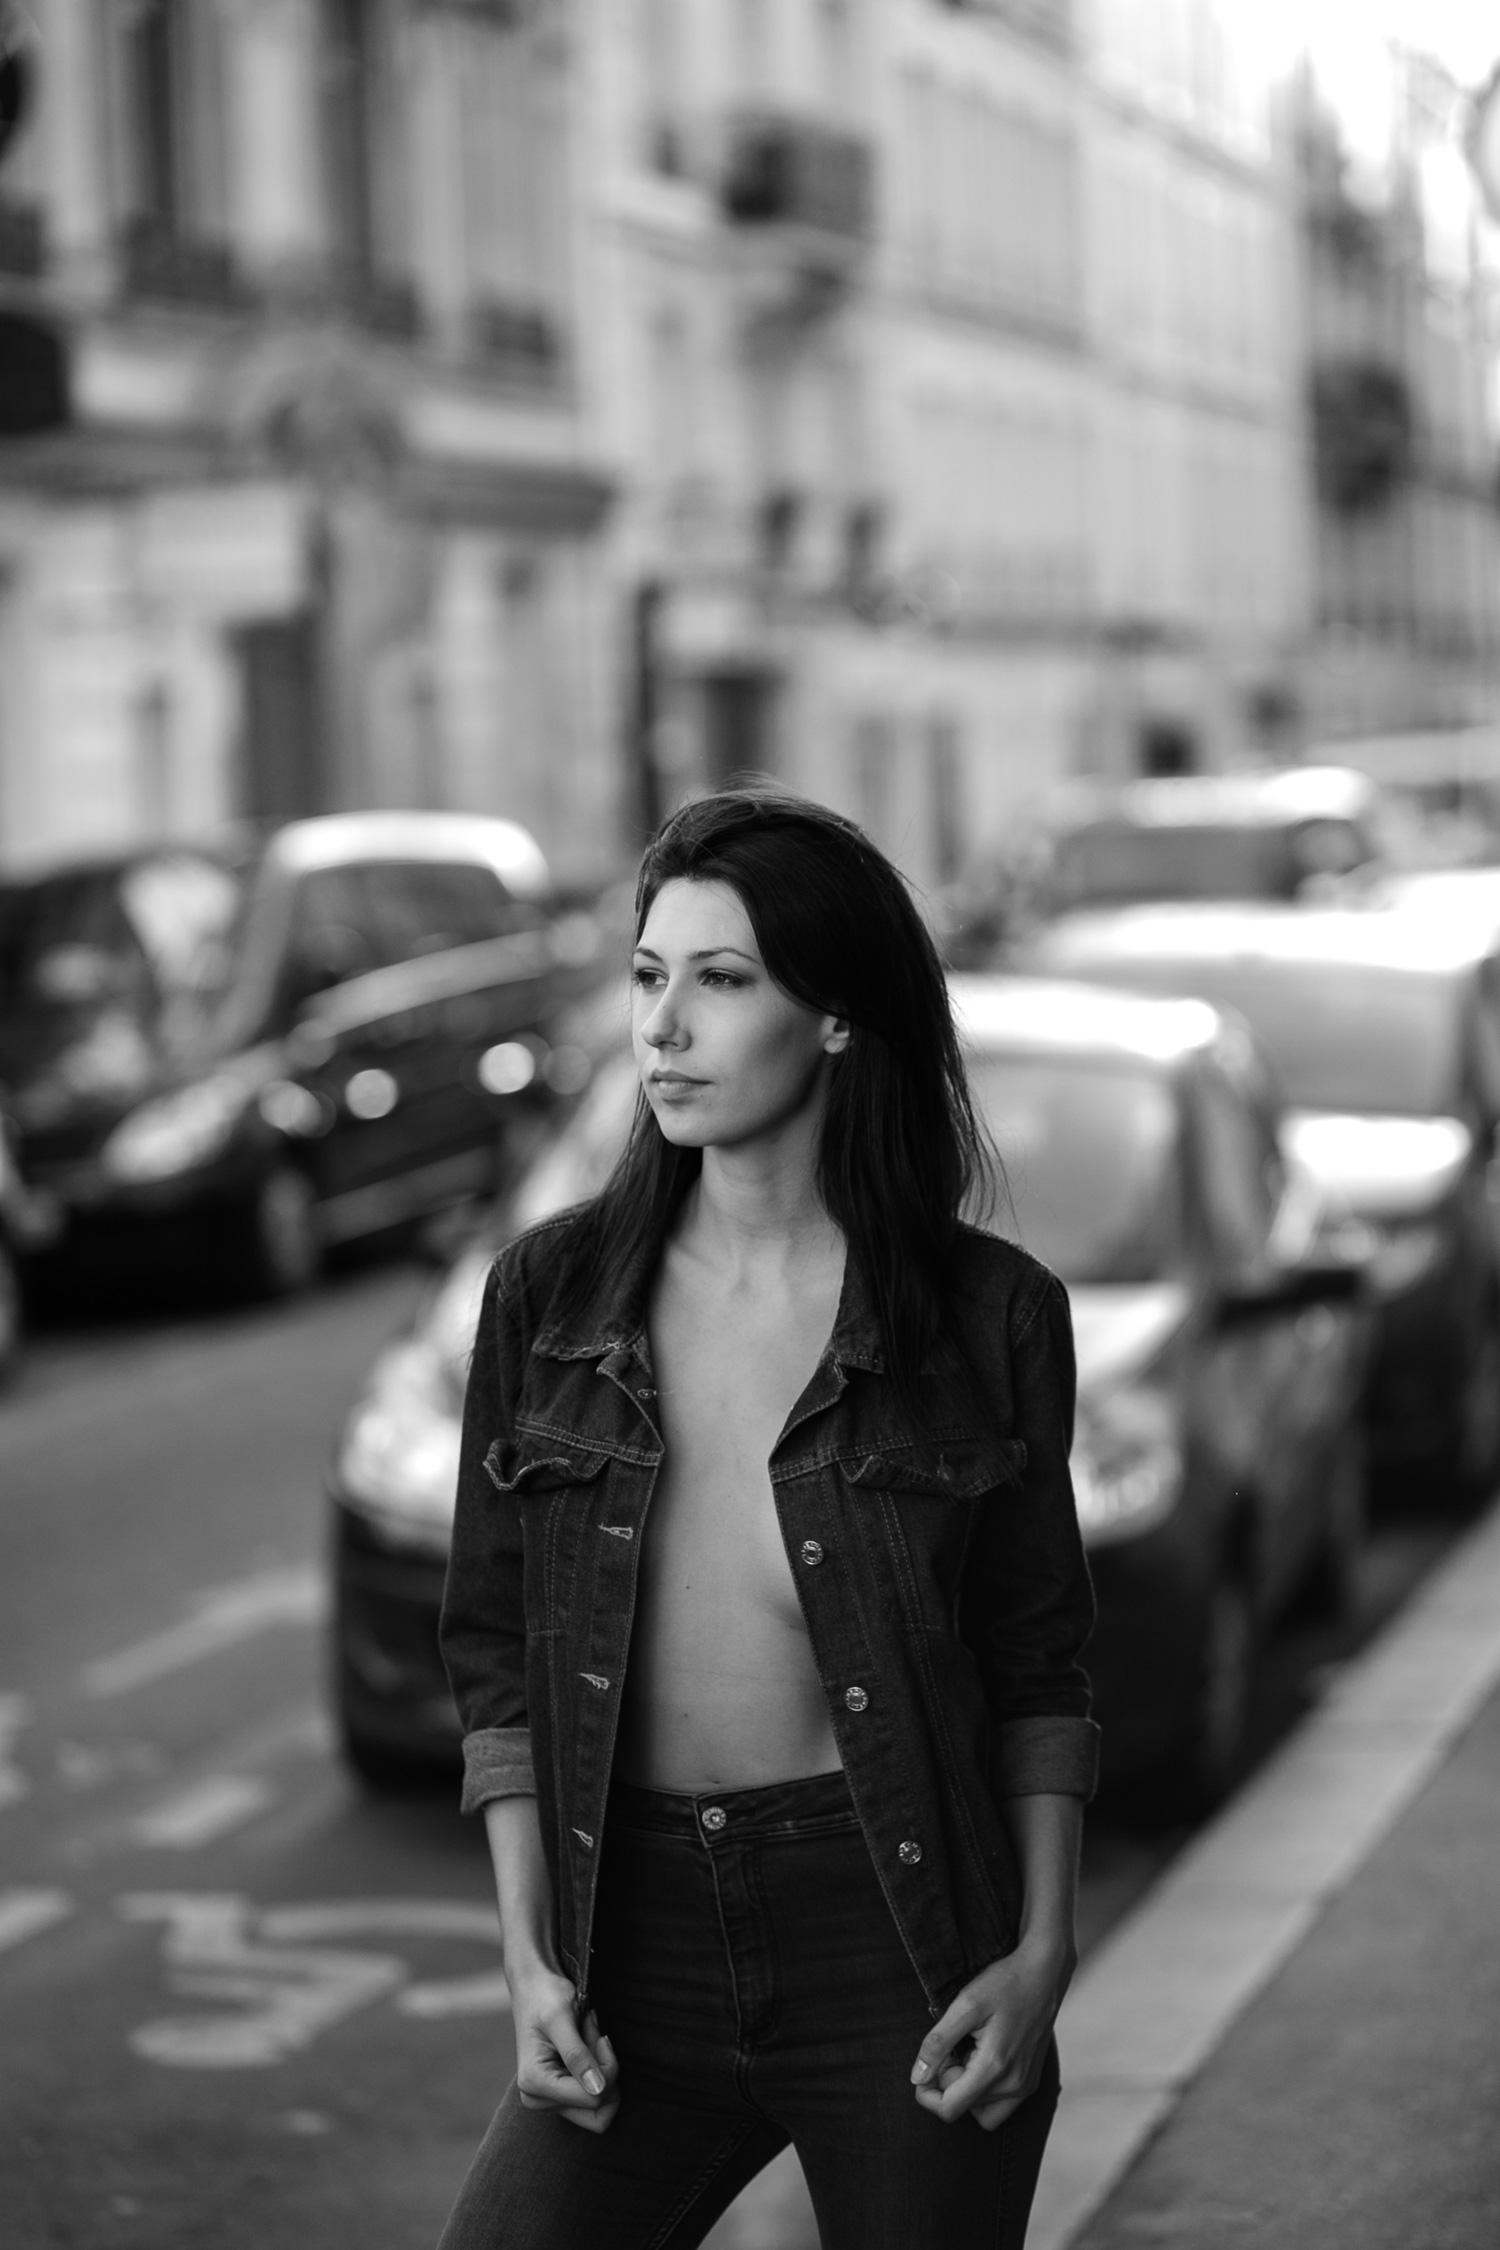 009-Paris-street-style.jpg